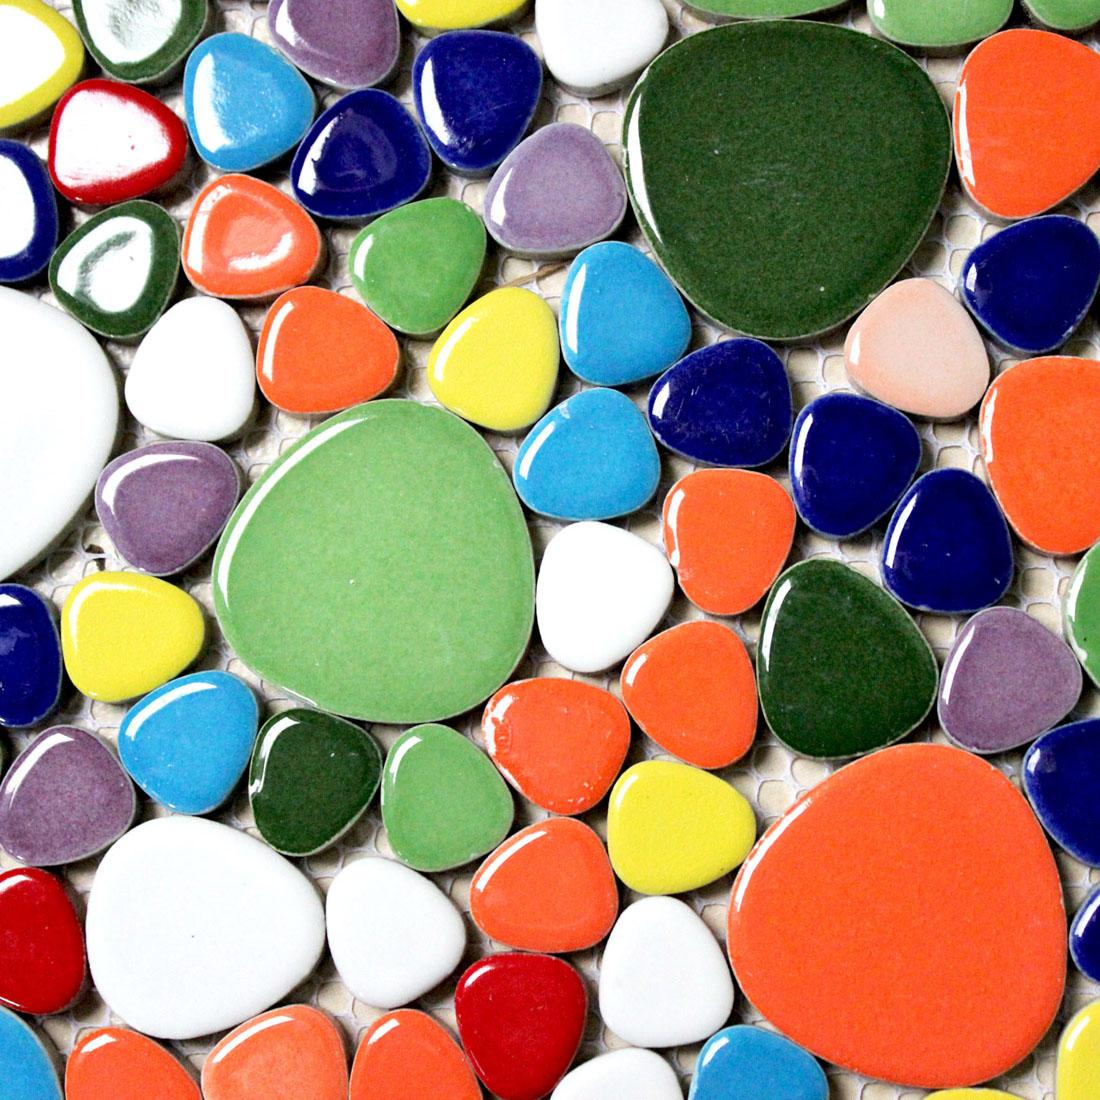 Glastegels In Badkamer ~ kiezel stenen tegels Promotie Winkel voor promoties kiezel stenen